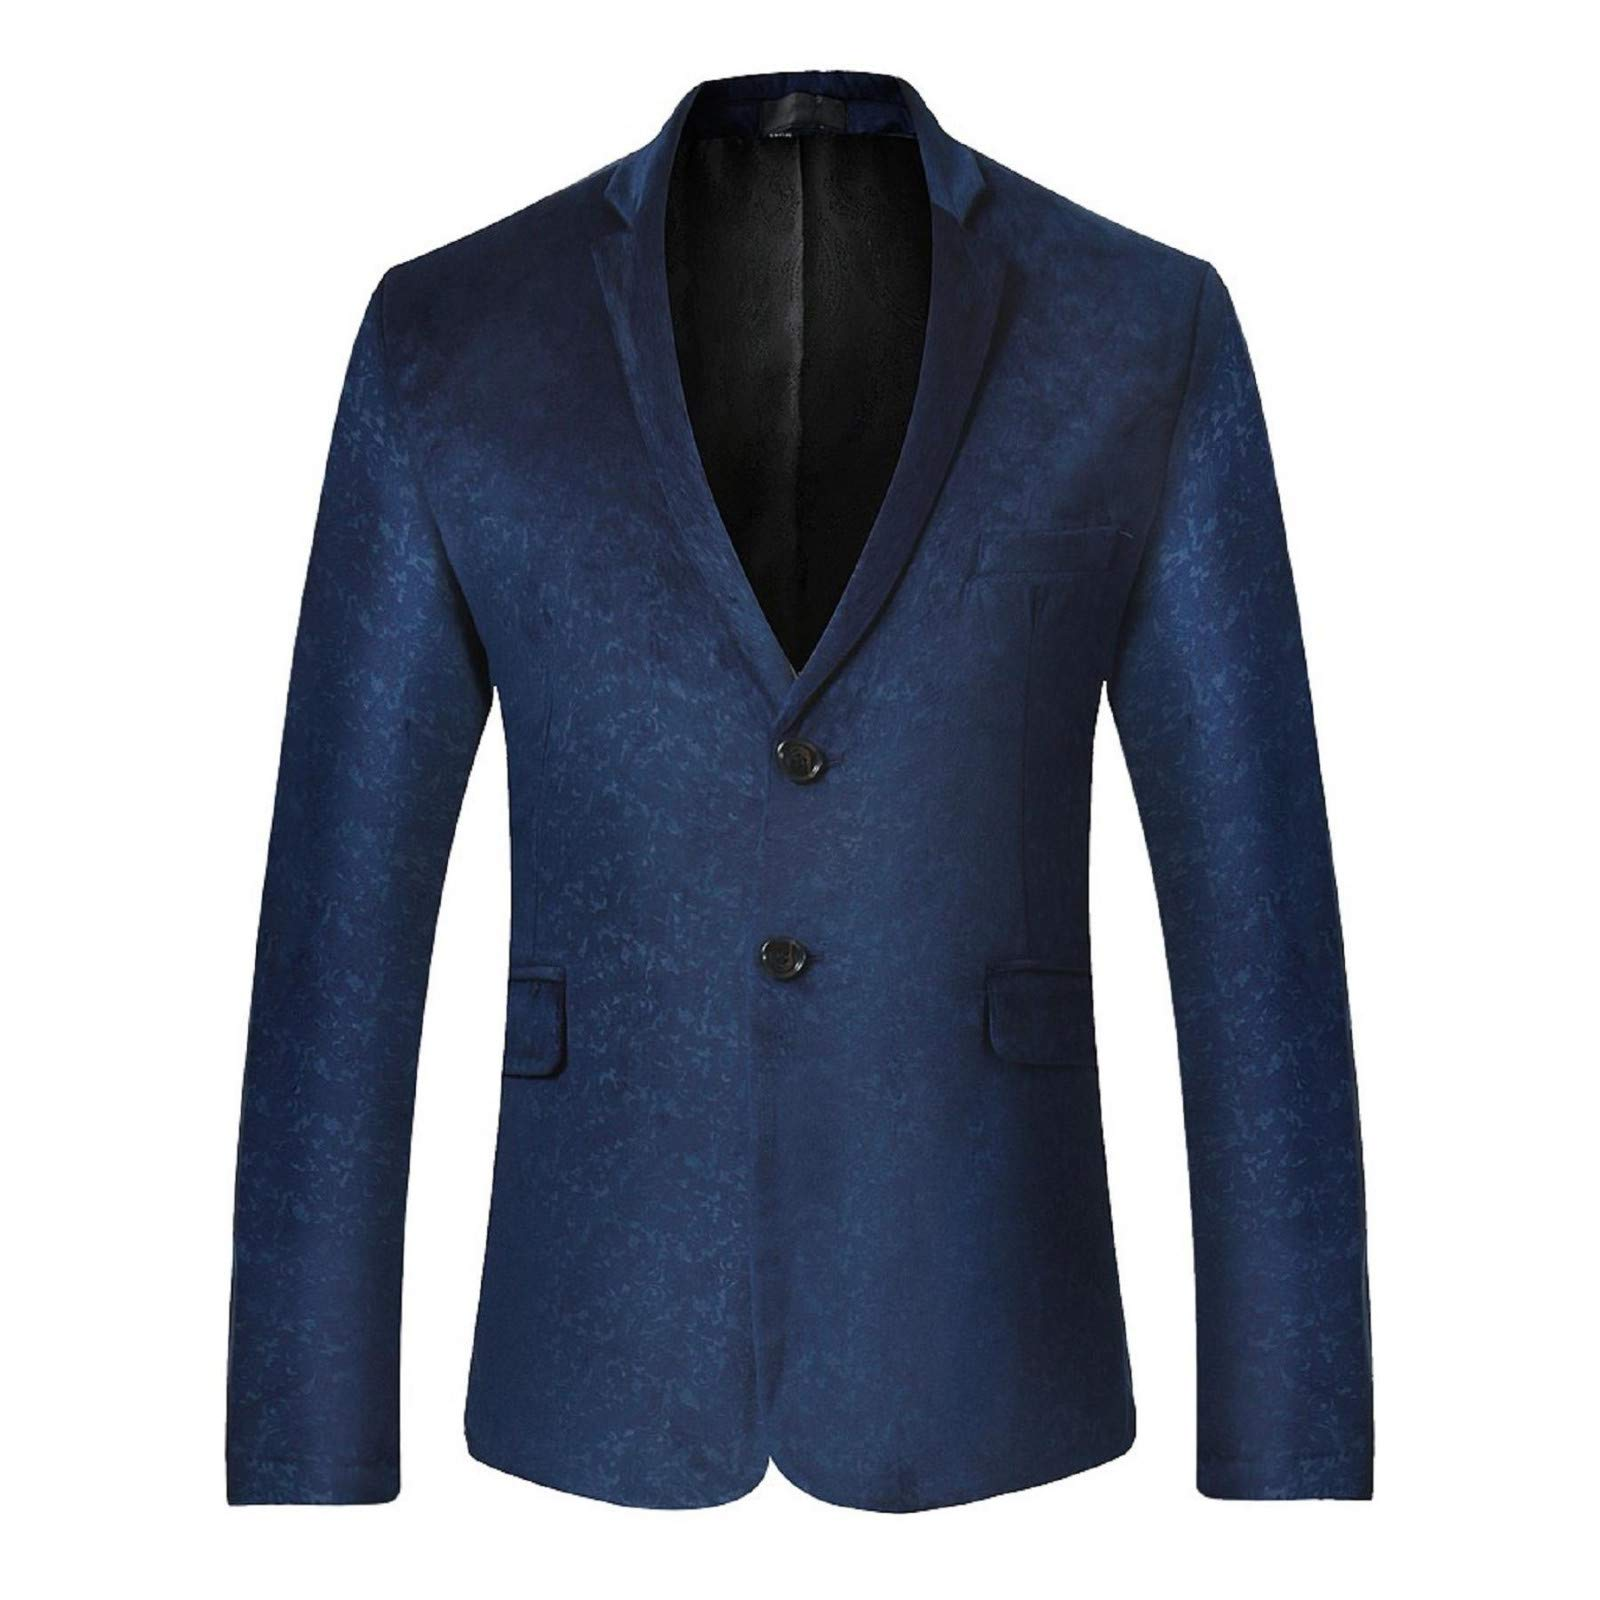 BingYELH Prom Suit for Men,Men's Floral Party Suit Slim Fit Stylish Dinner Jacket Wedding Blazer Prom Navy